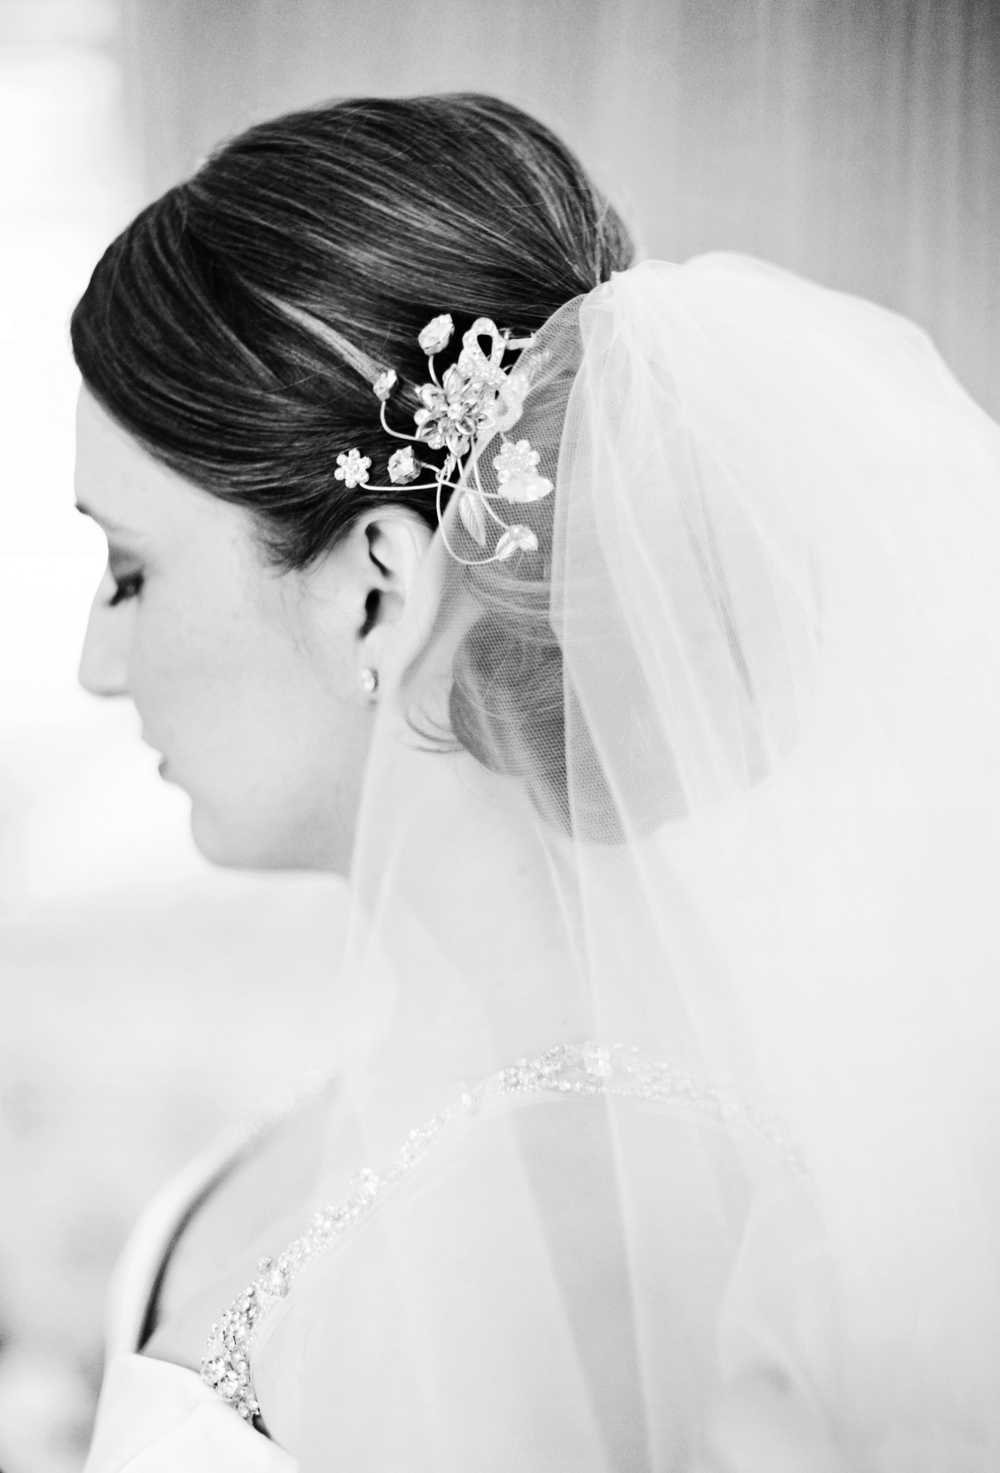 Bridal hair up with veil